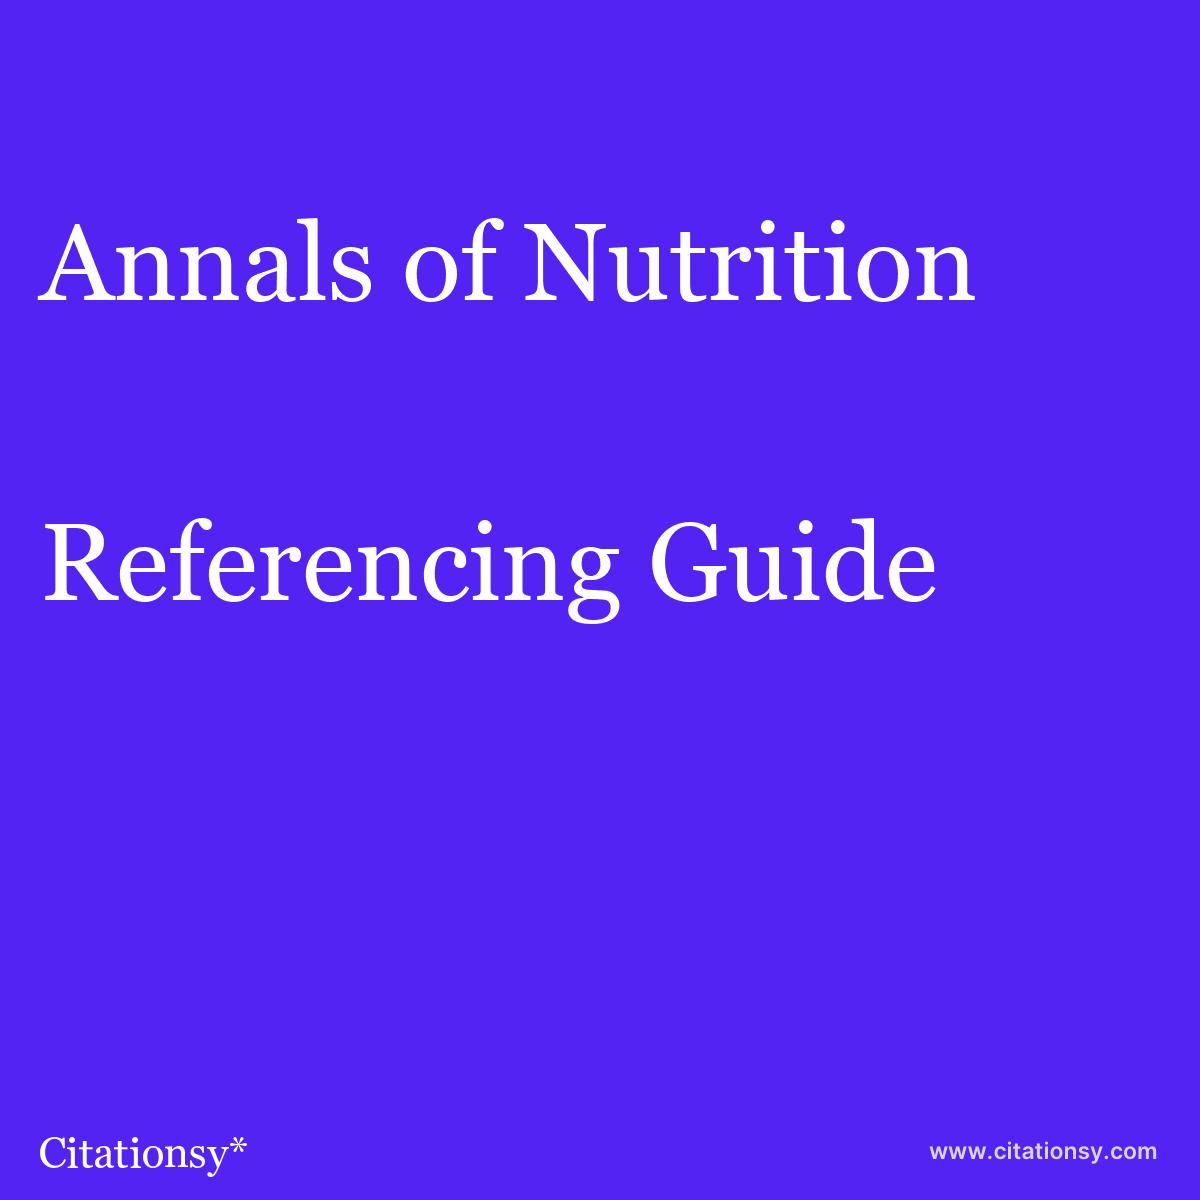 Annals of Nutrition & Metabolism